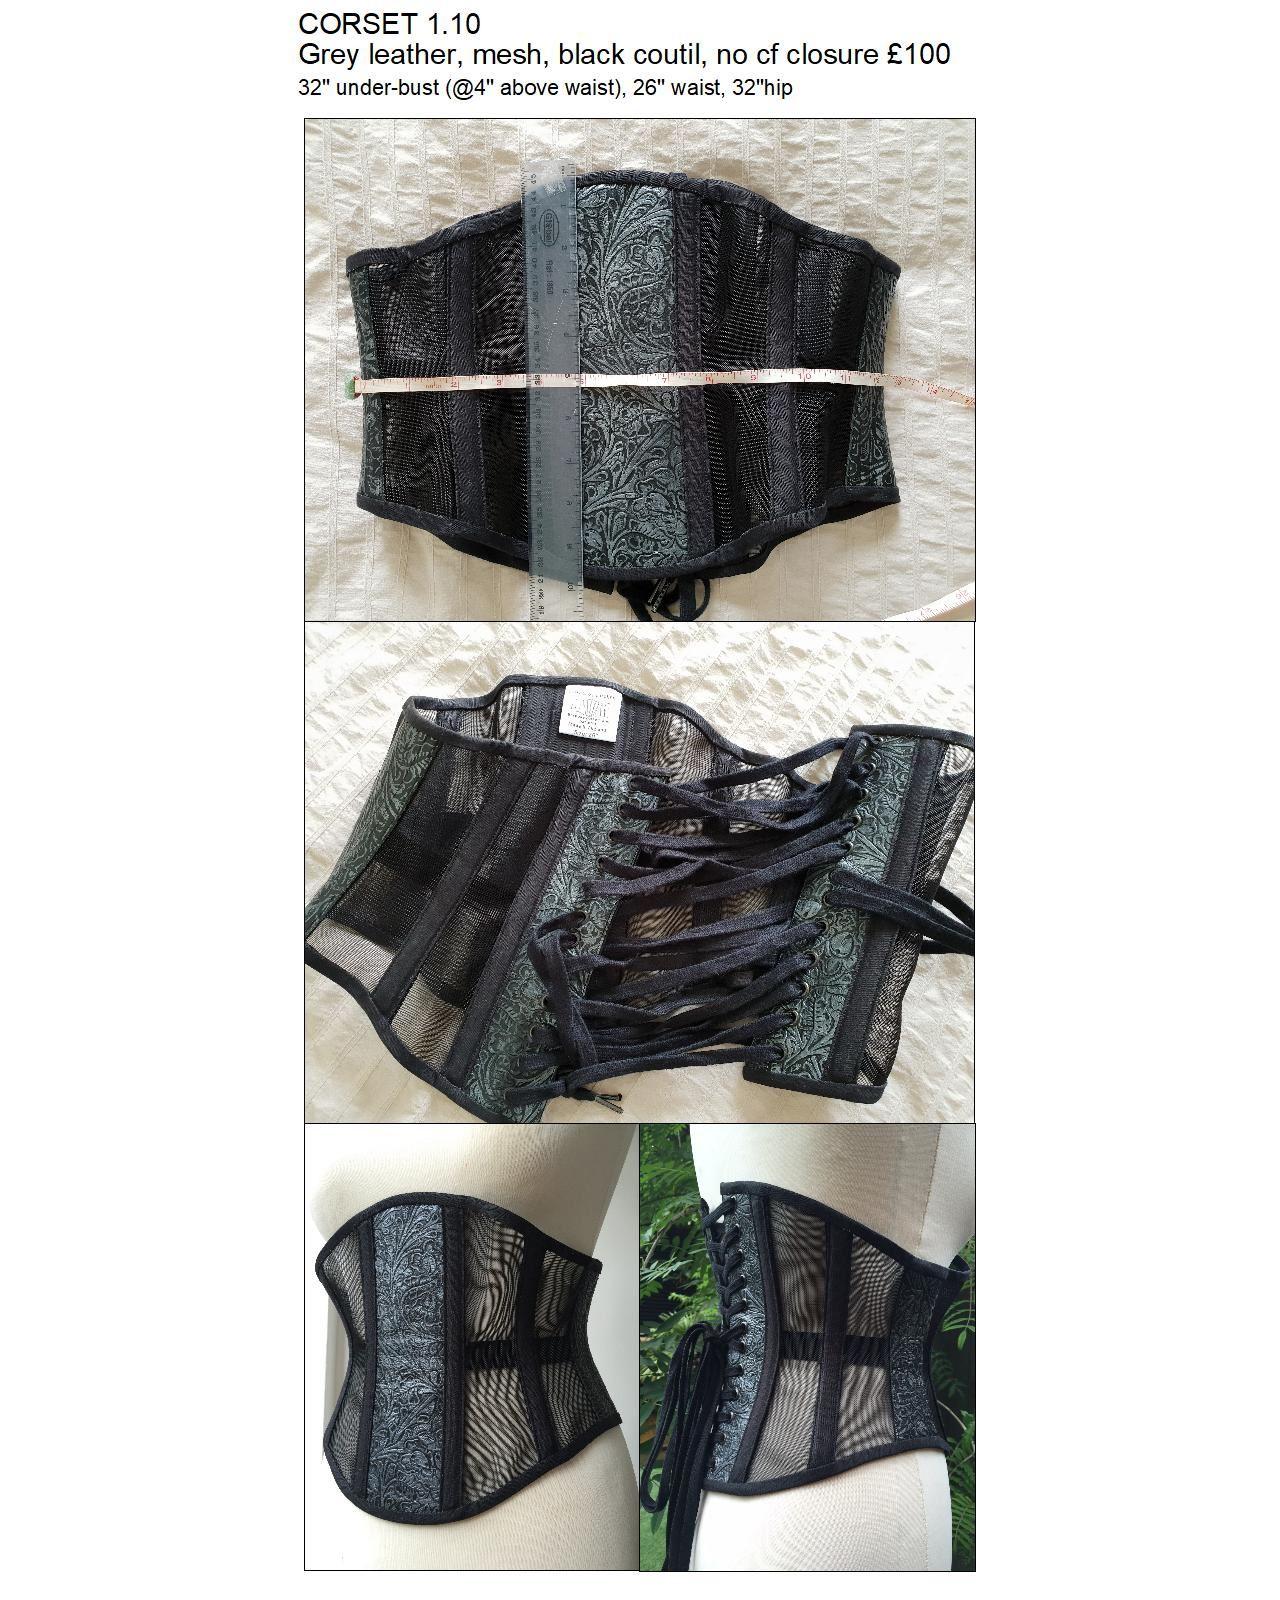 1.10 grey leather and mesh ub